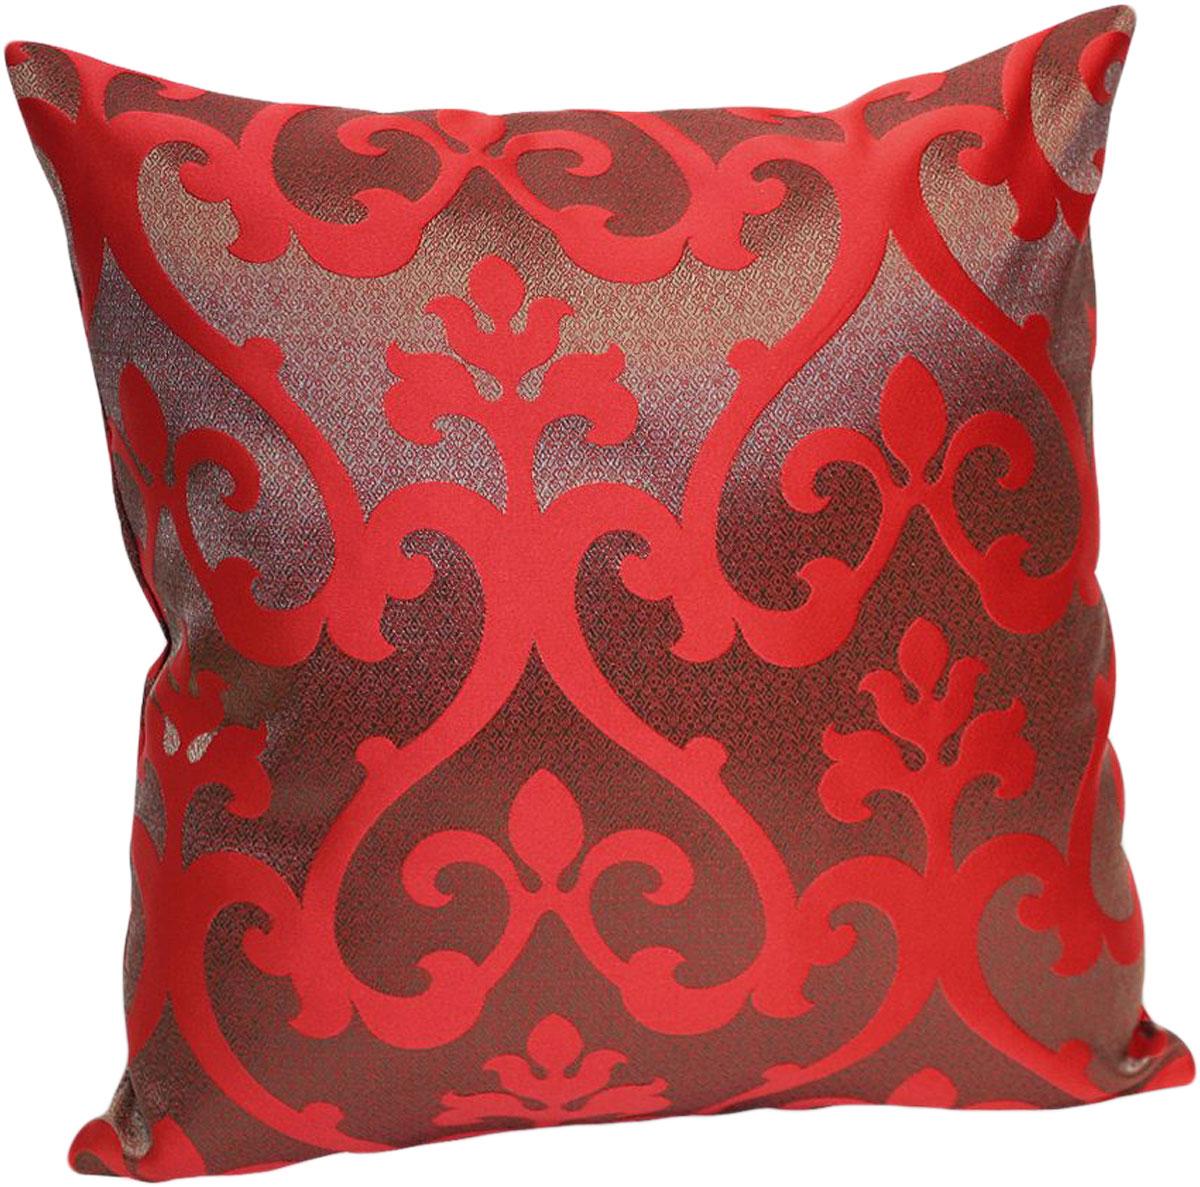 Подушка декоративная KauffOrt Флорентина, цвет: темно-красный, 40 x см